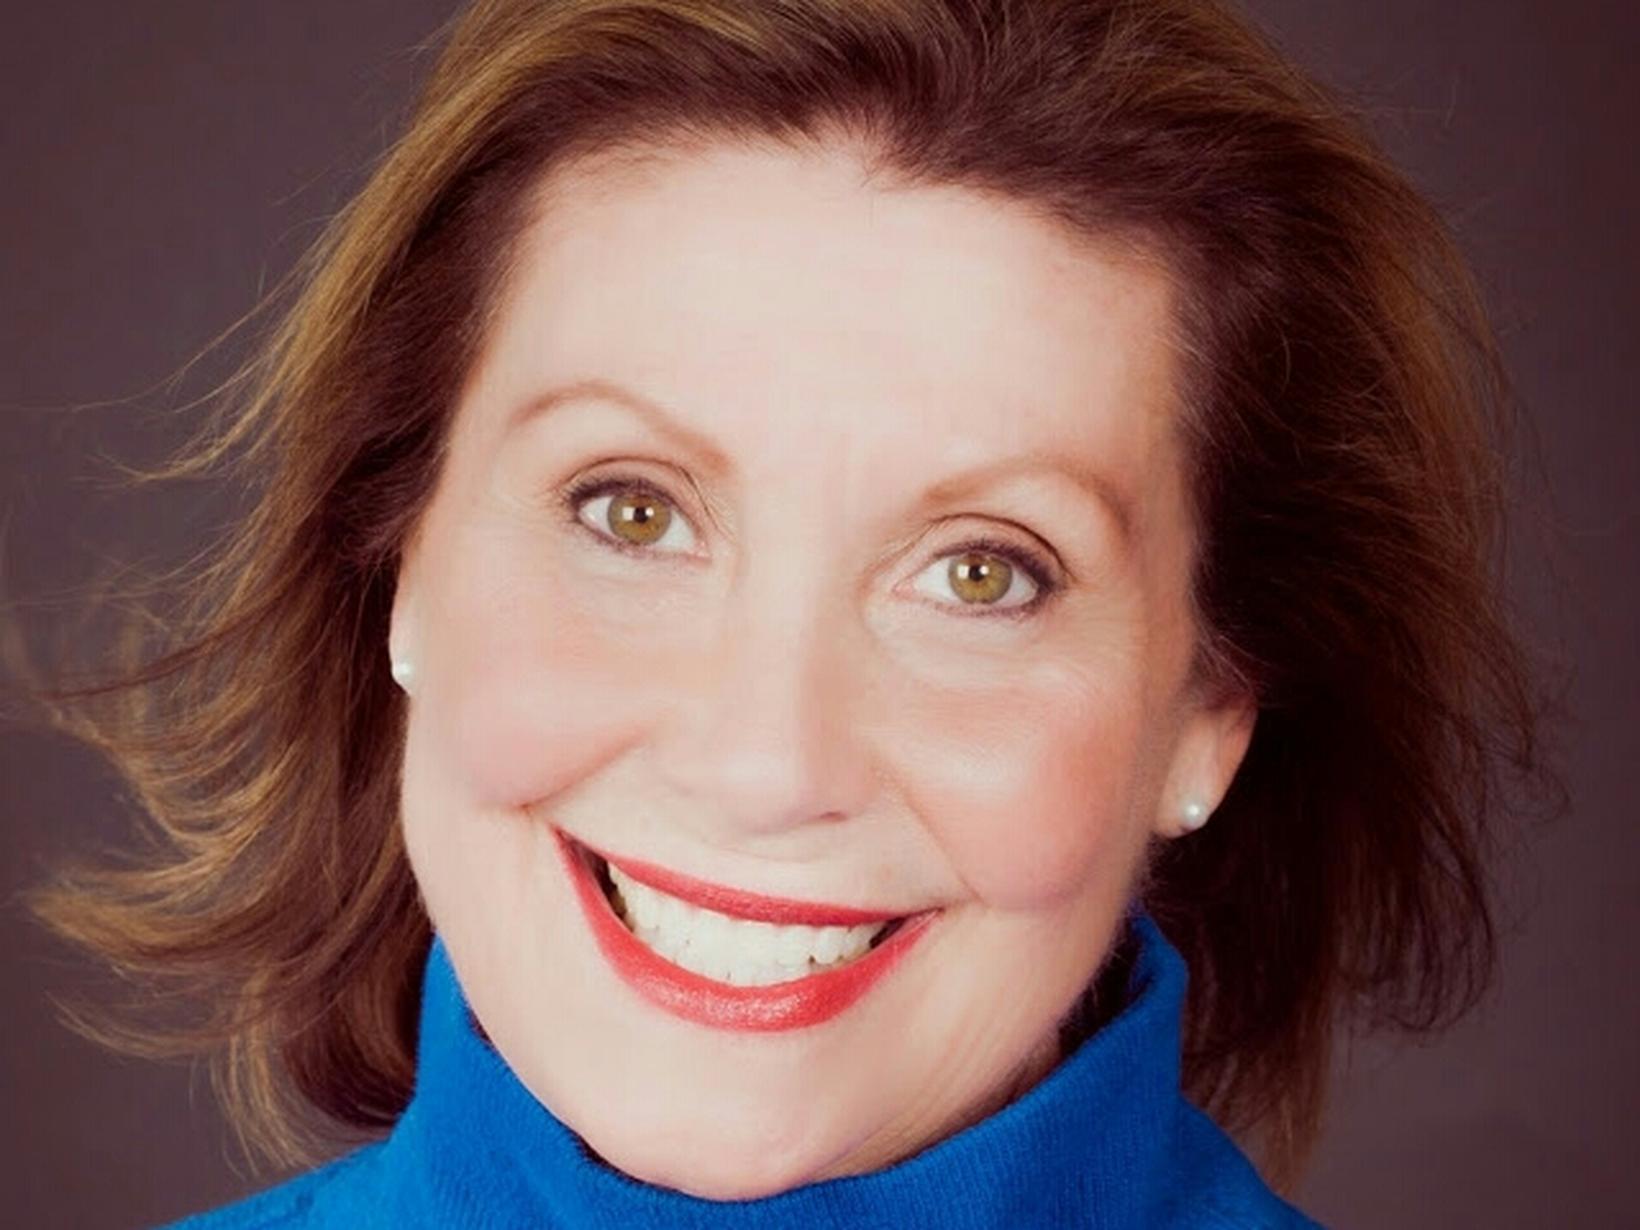 Jeannine from Hailey, Idaho, United States